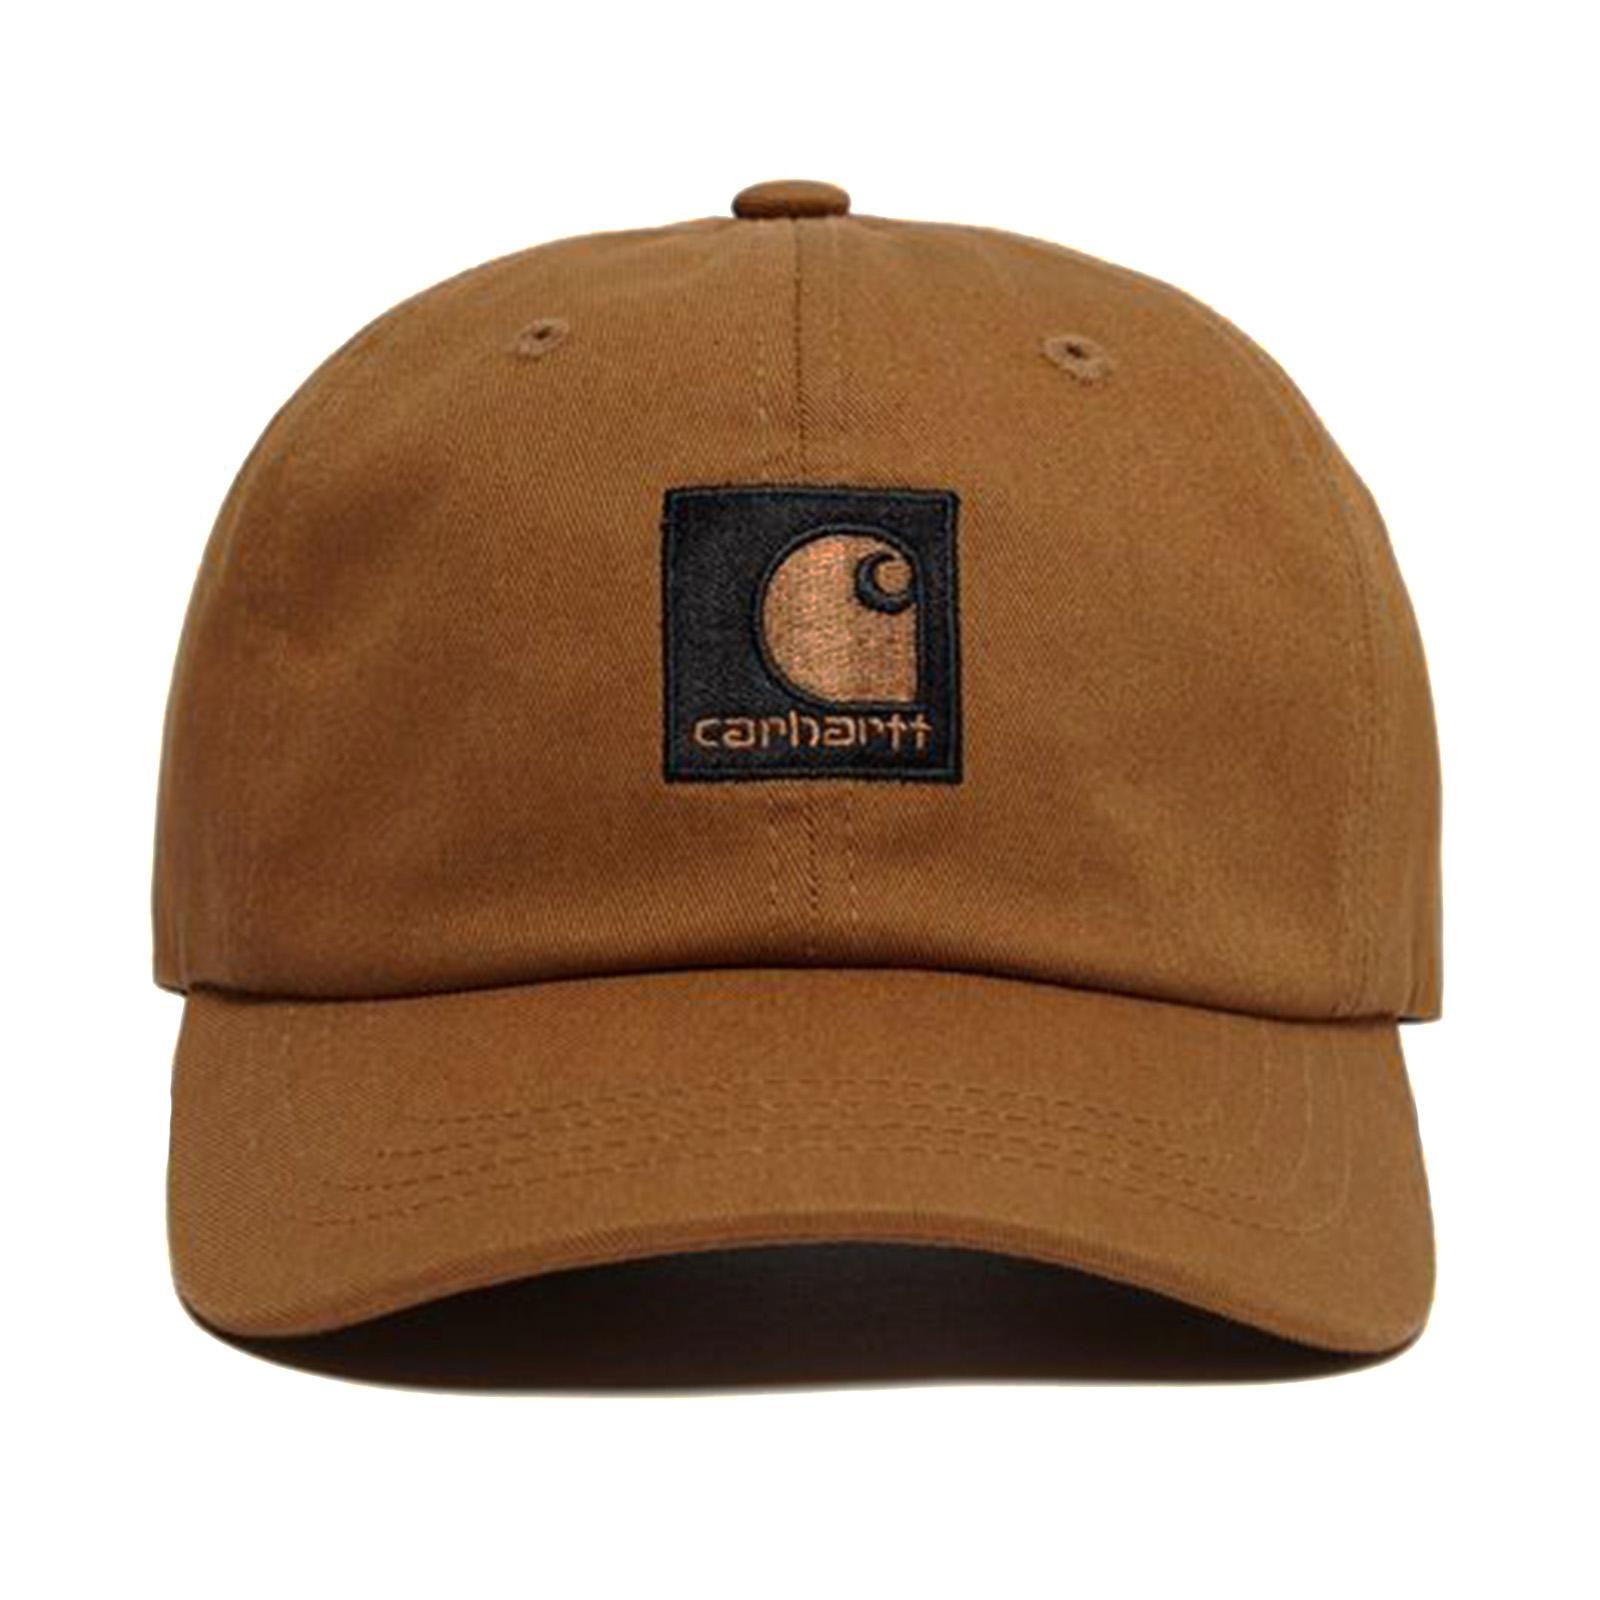 Carhartt Lewiston Cap Hamilton Brown Black - Cappellino Con Visiera Marrone 8b1d6c865f02